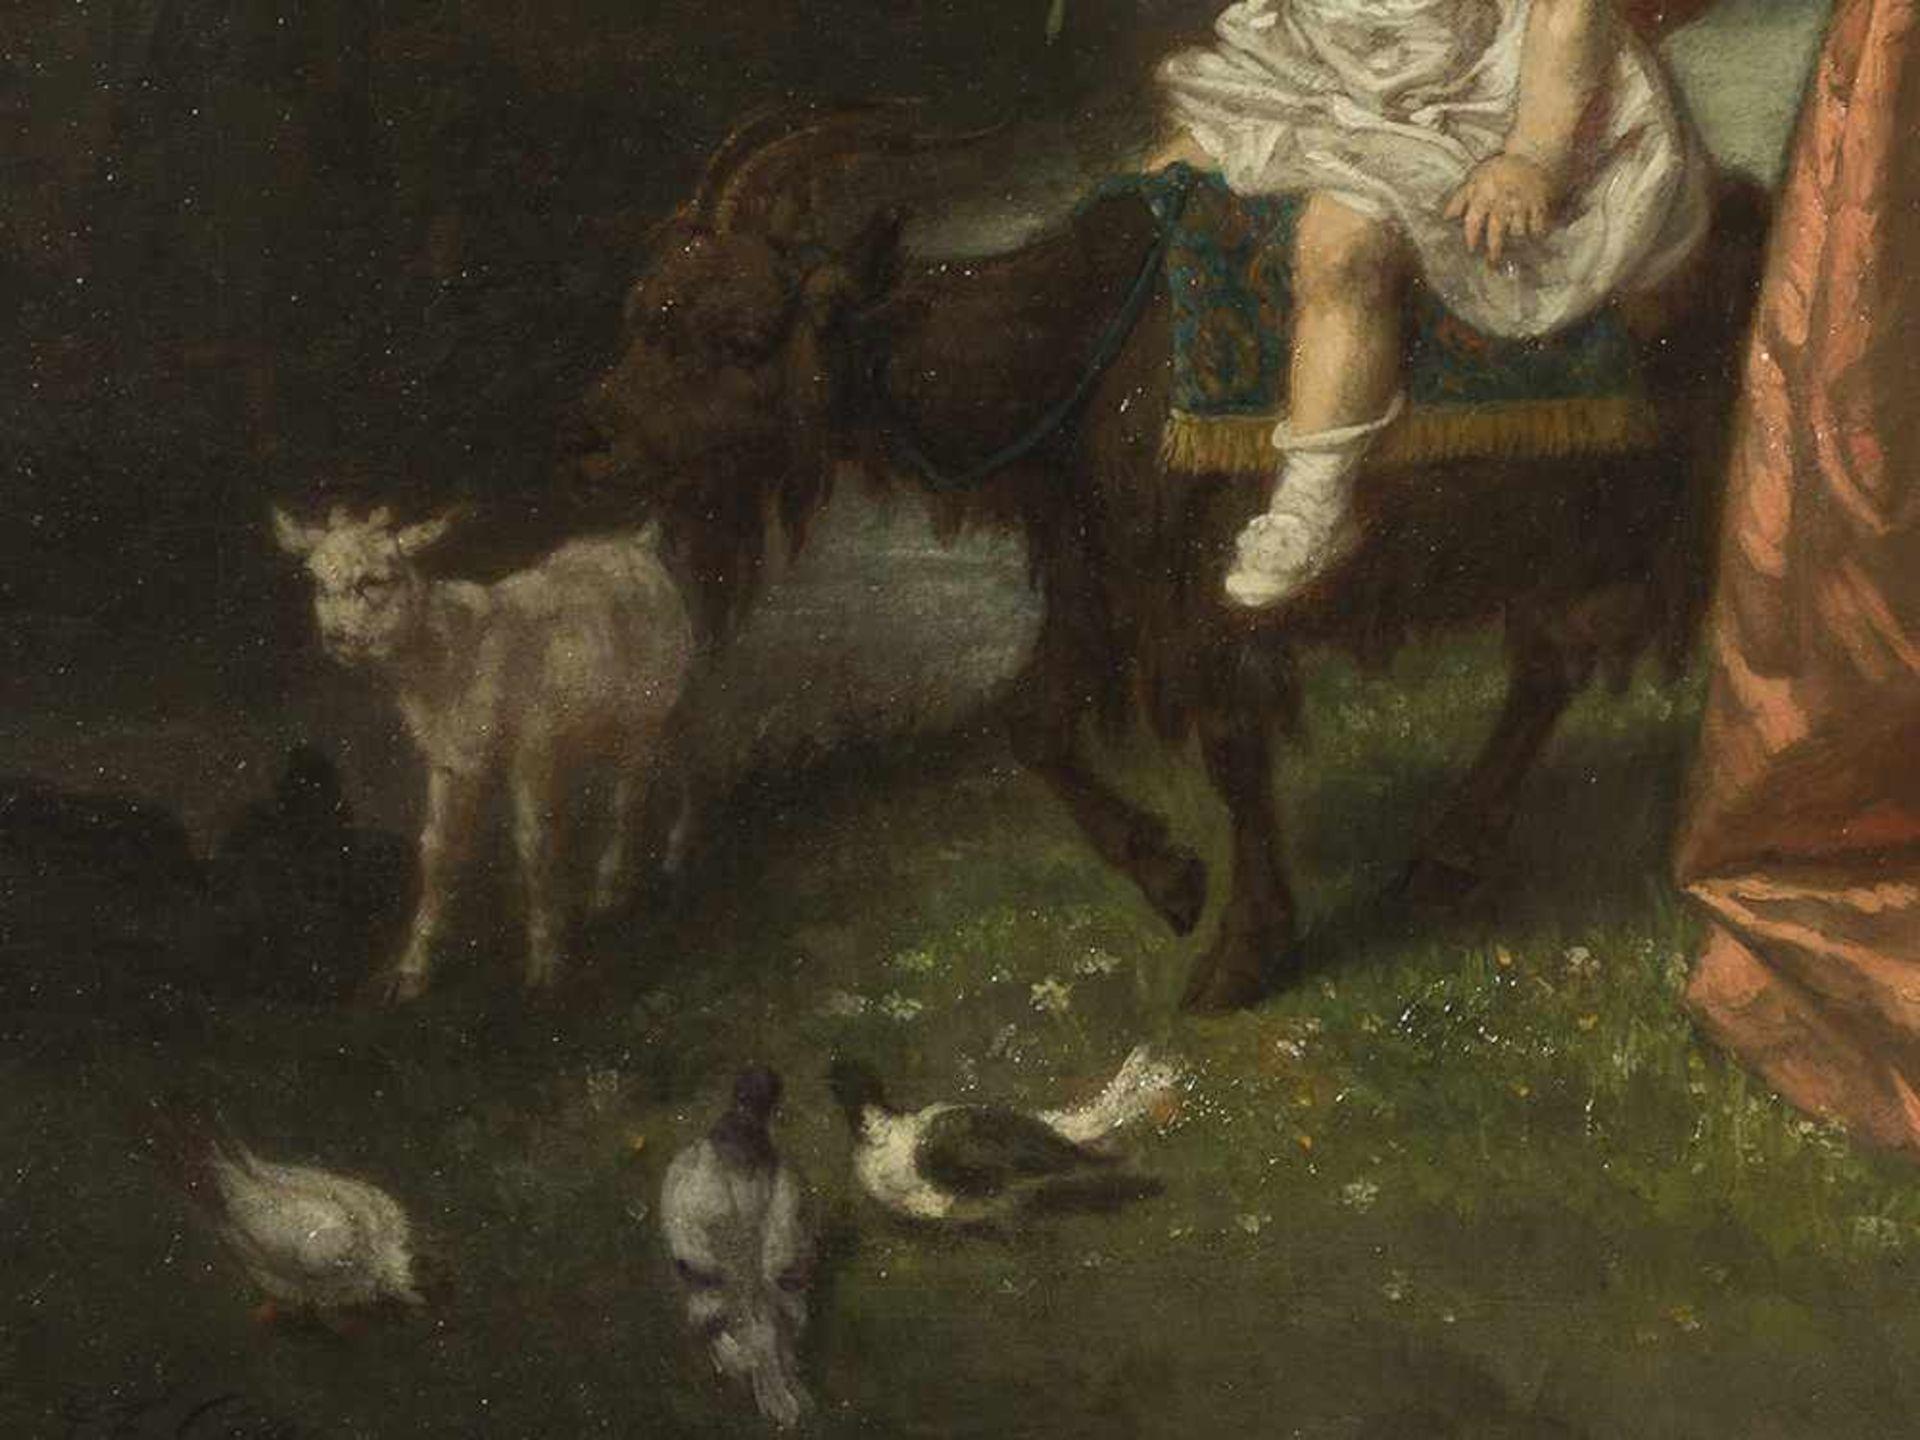 Los 62 - Jean-Francois Gose (1827-1870),Erste Reitstunde, Öl, 1860 Öl auf Leinwand, randdoubliert.